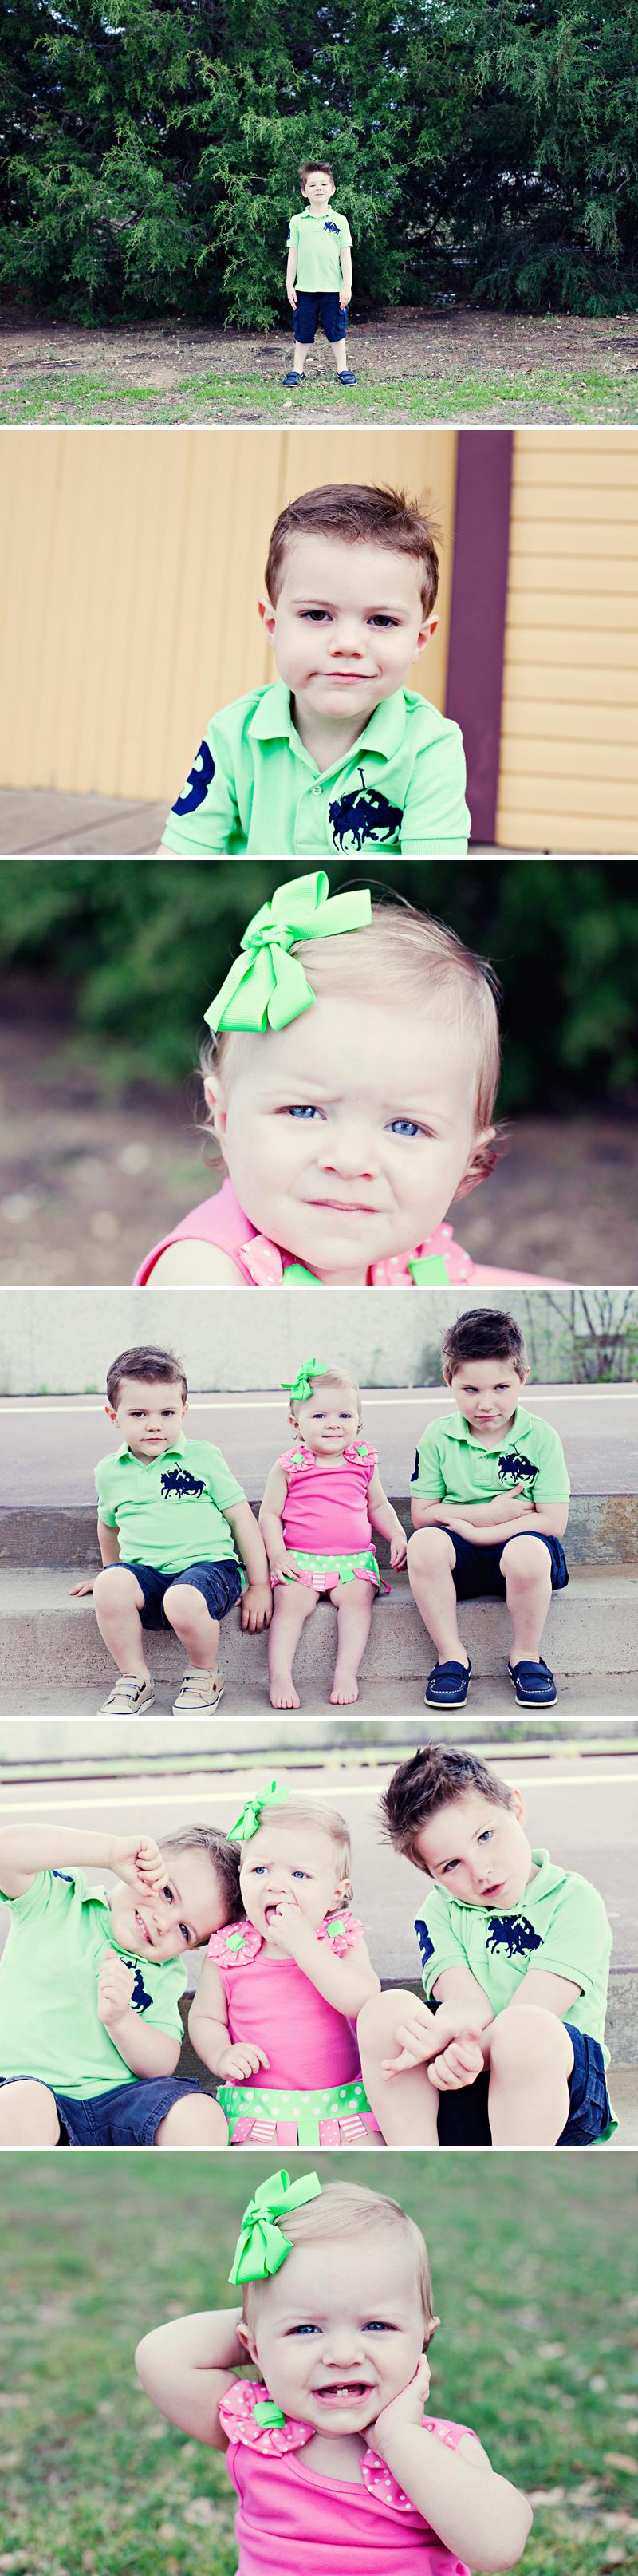 Dallas-Family-Photographerc008